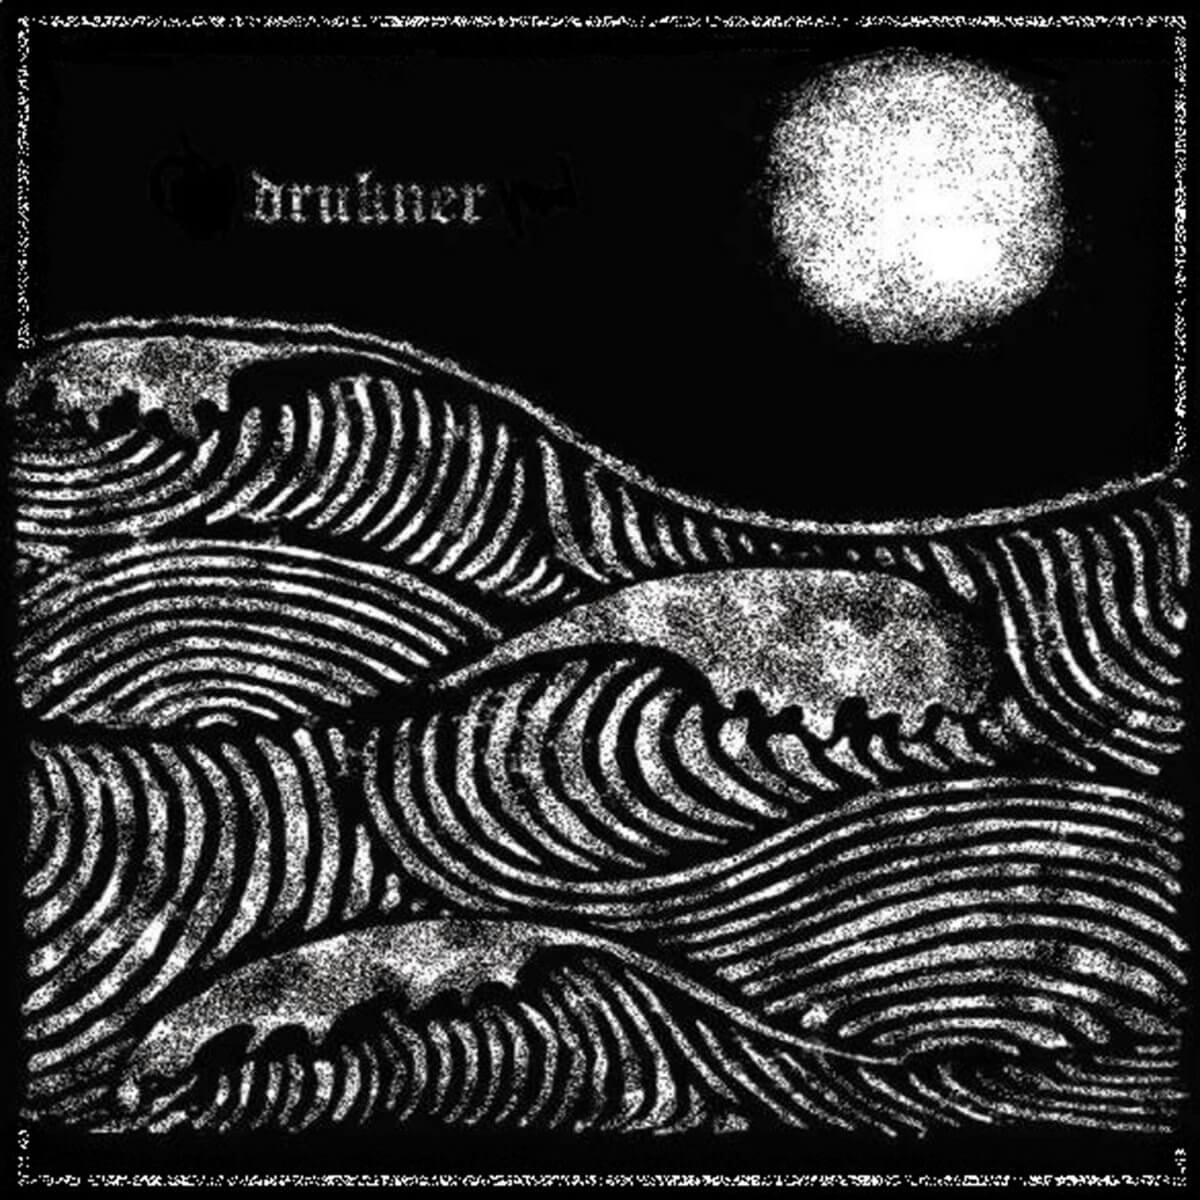 Interview med Drukner